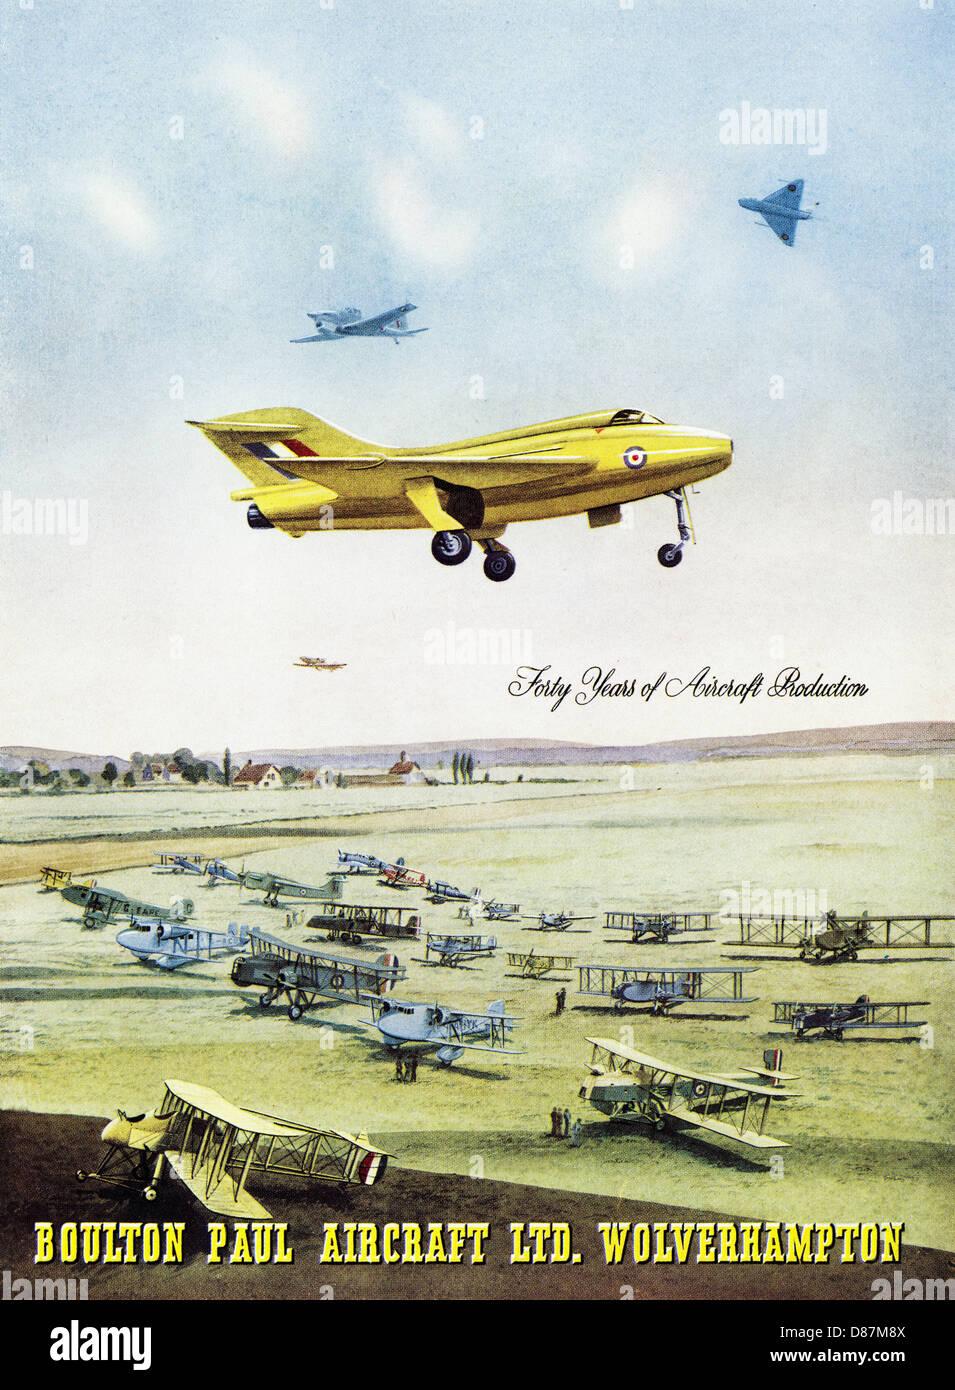 Advert for aircraft manufacturer BOULTON PAUL AIRCRAFT LTD WOLVERHAMPTON advertisement in trade magazine circa 1955 Stock Photo